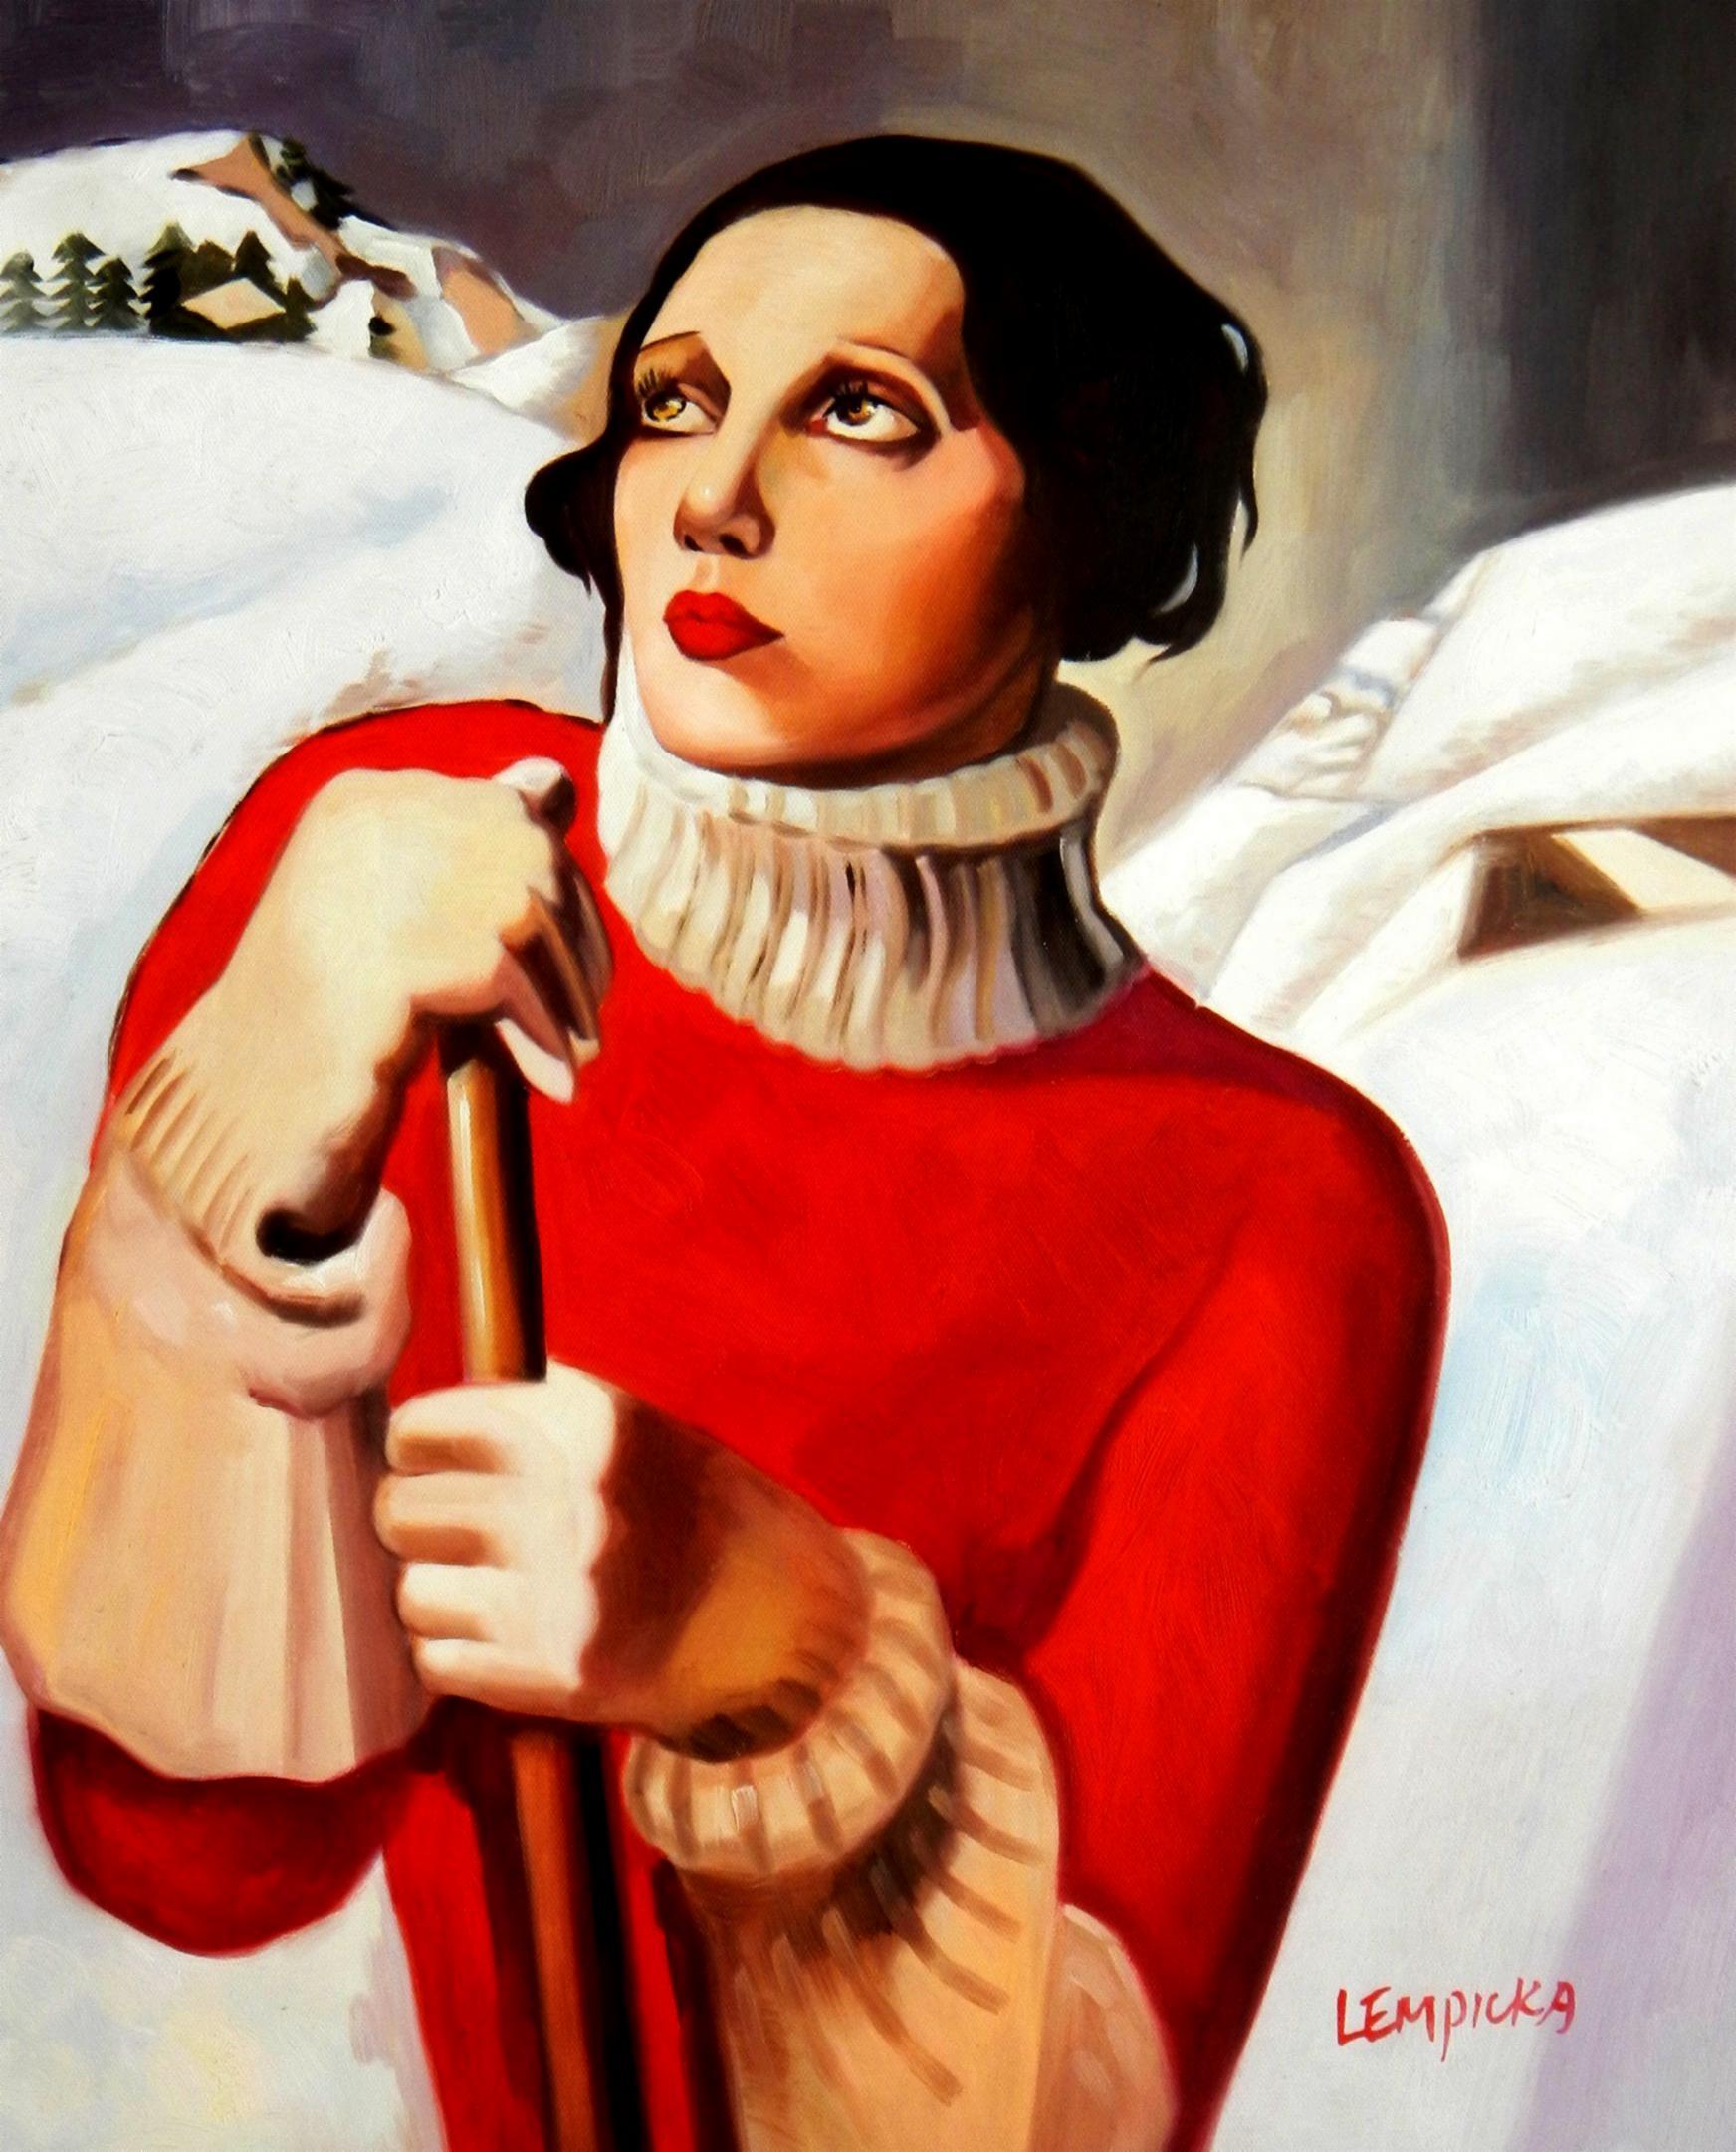 Homage to T. Lempicka - Sain Moritz b94543 40x50cm handgemaltes Gemälde